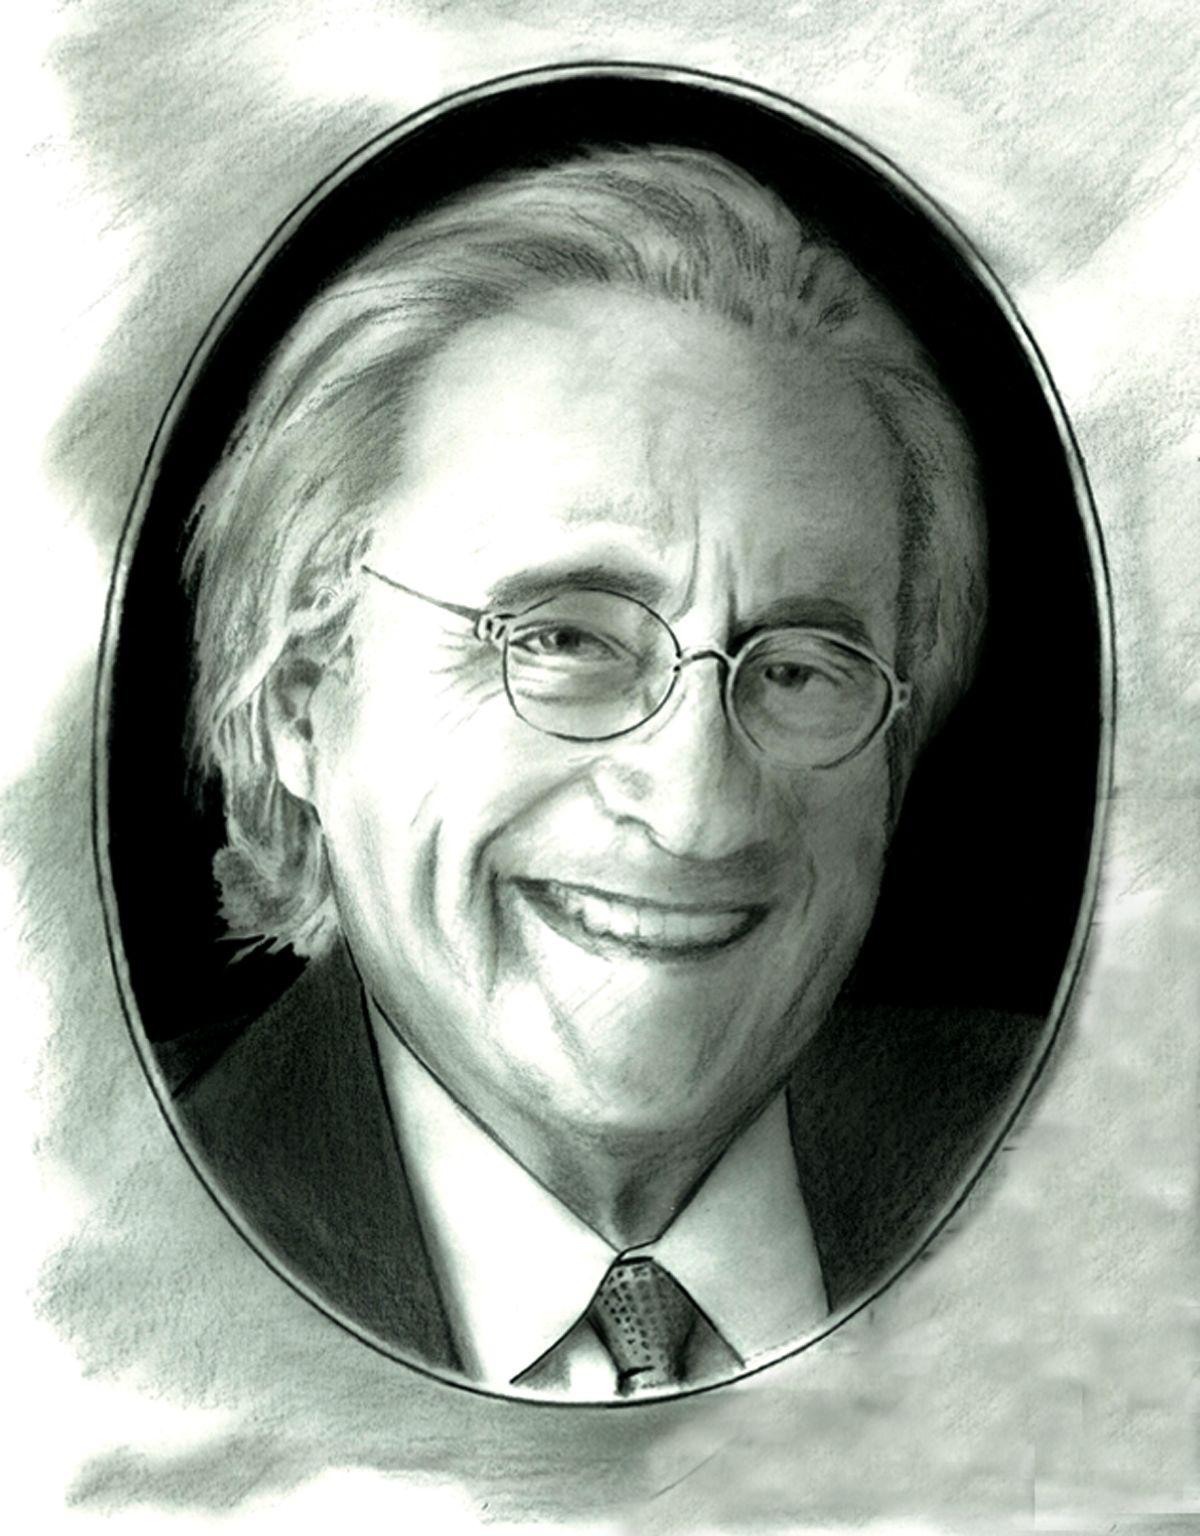 Portrait of Thomas Kline.